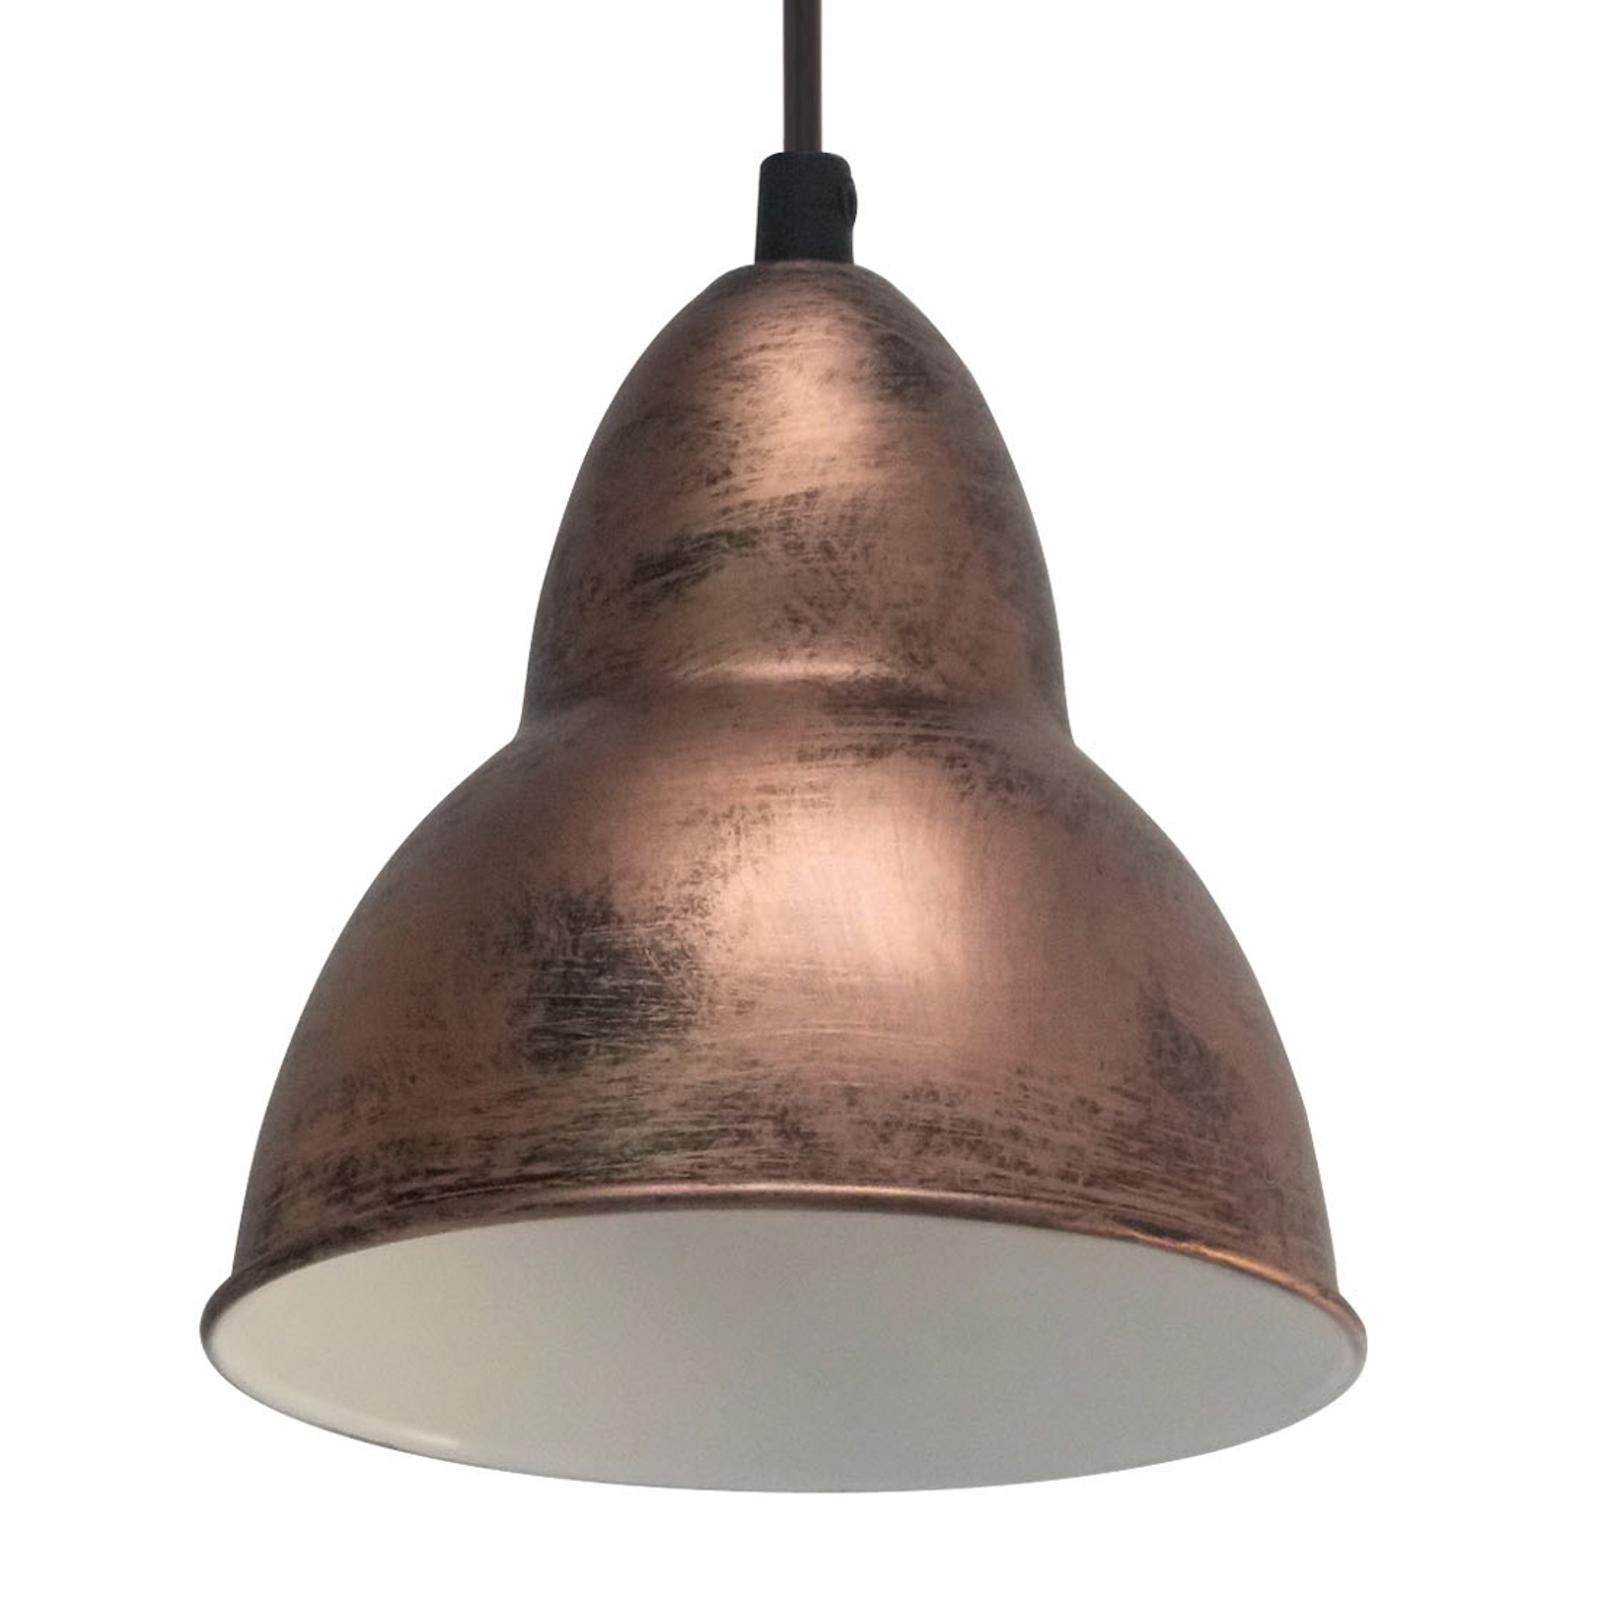 Vintage stijl - hanglamp Bojan koper